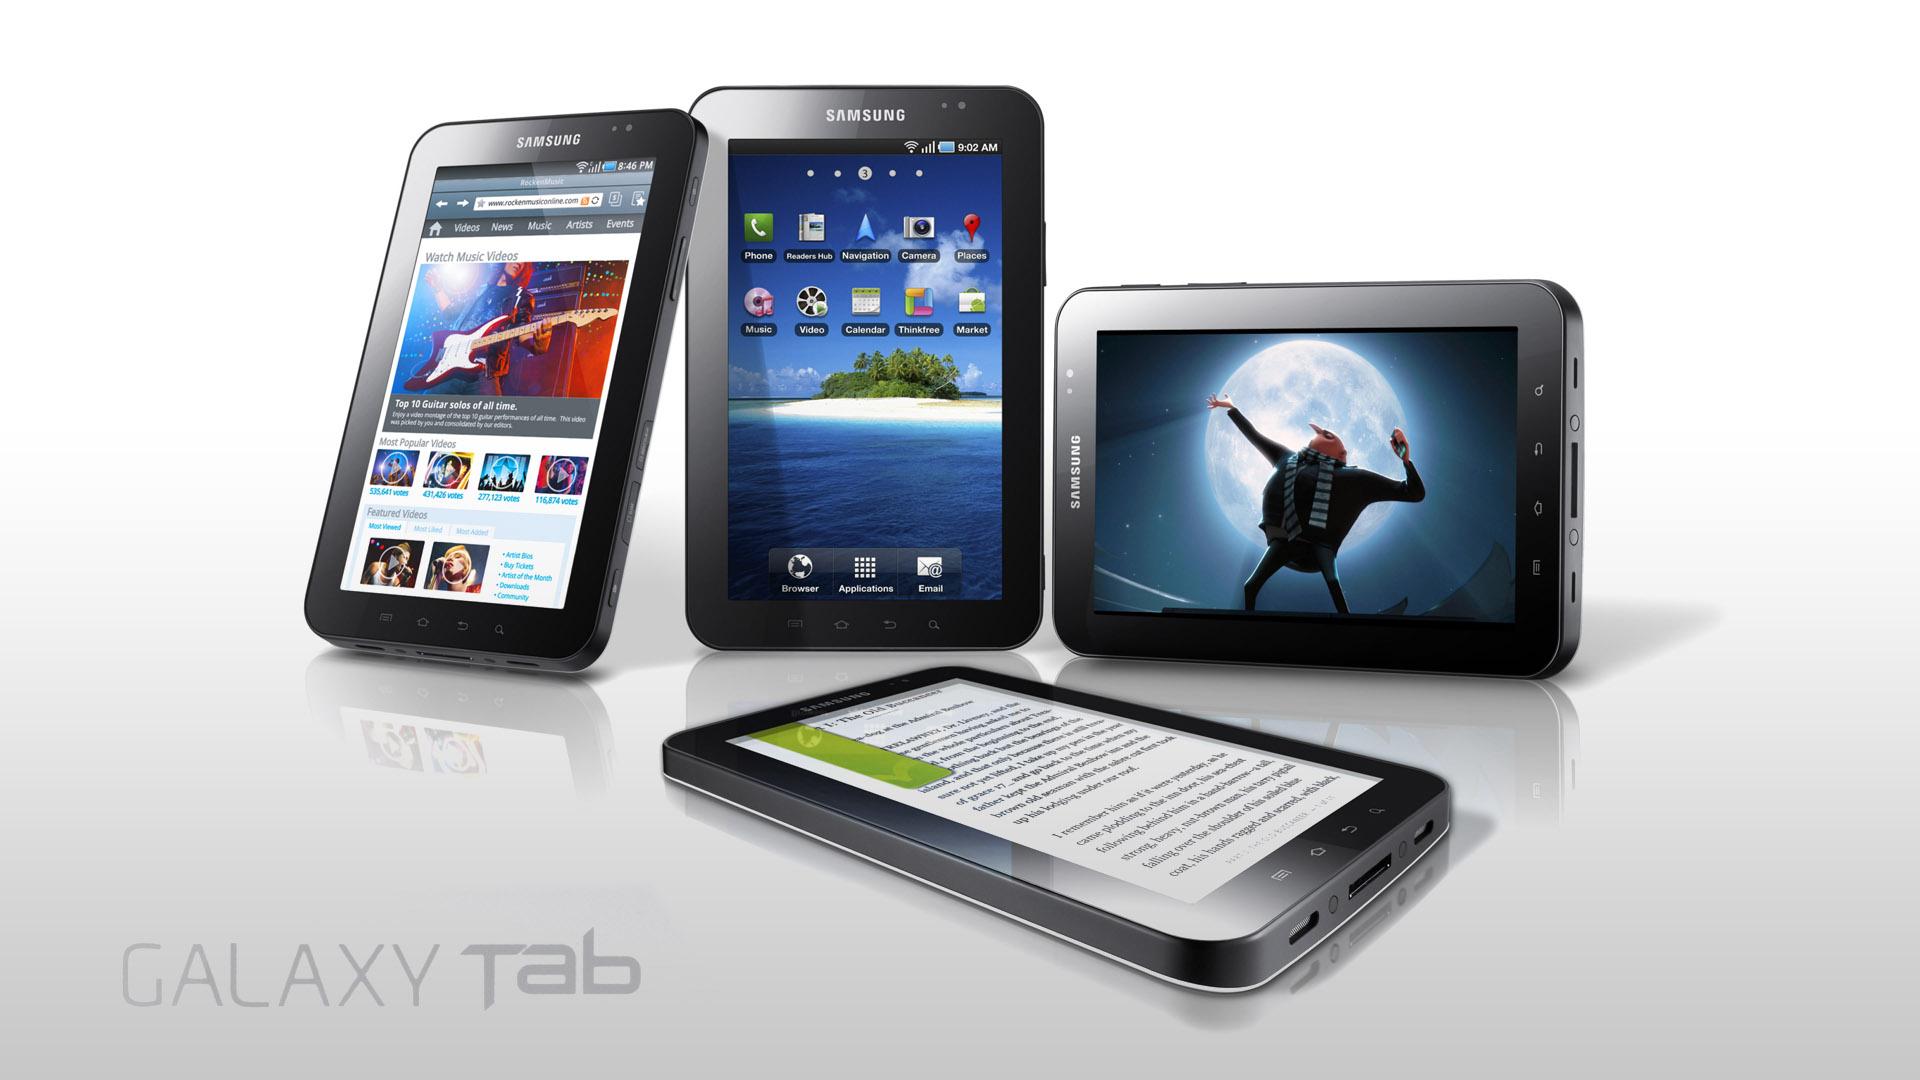 Samsung Galaxy Tab 1920x1080 HD Image Gadgets 1920x1080